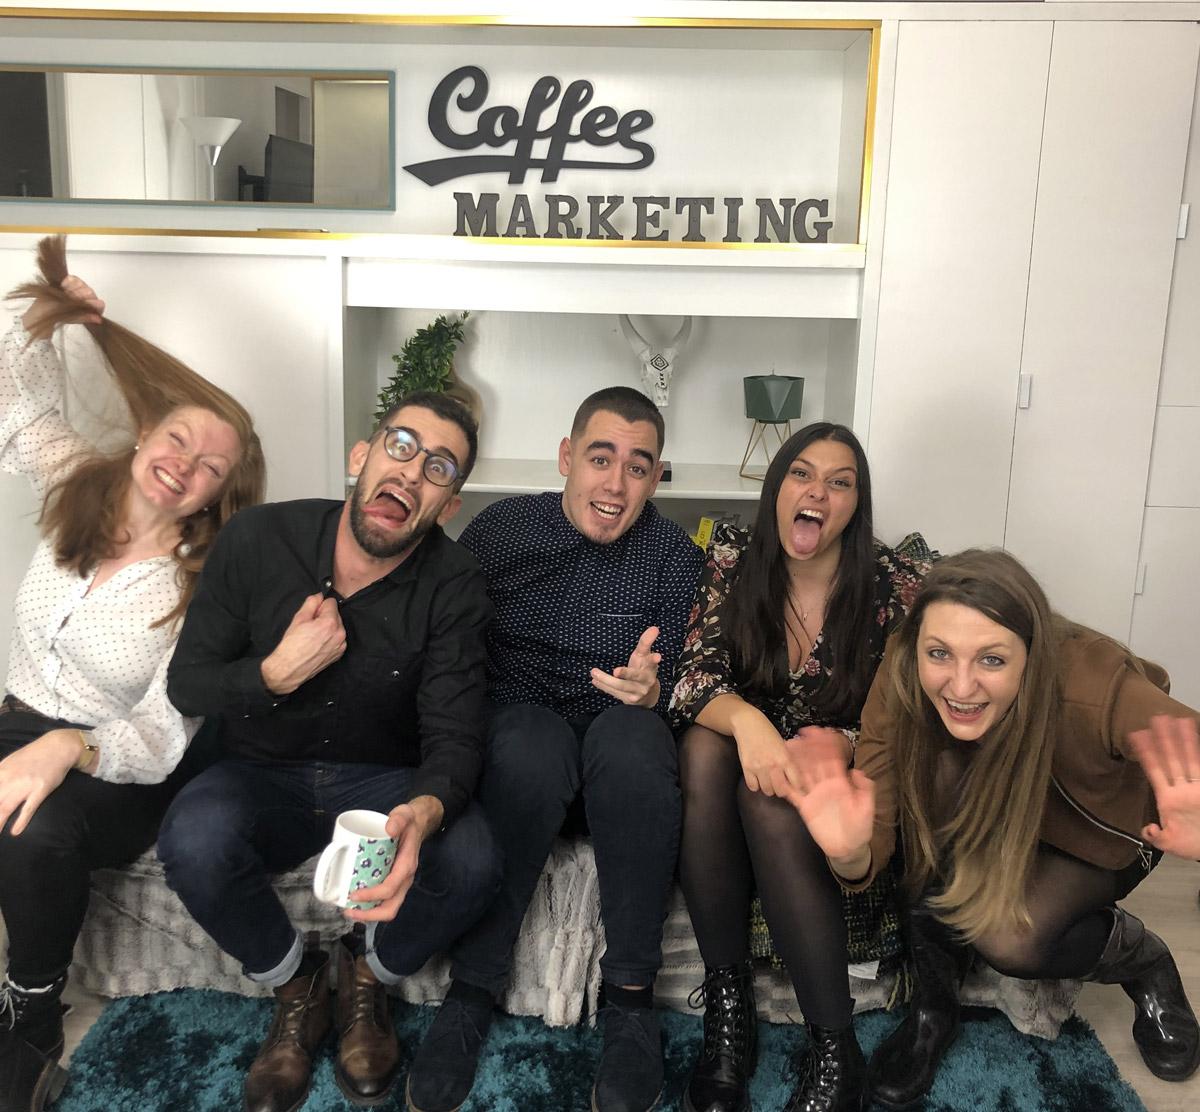 Team Coffee apres 2